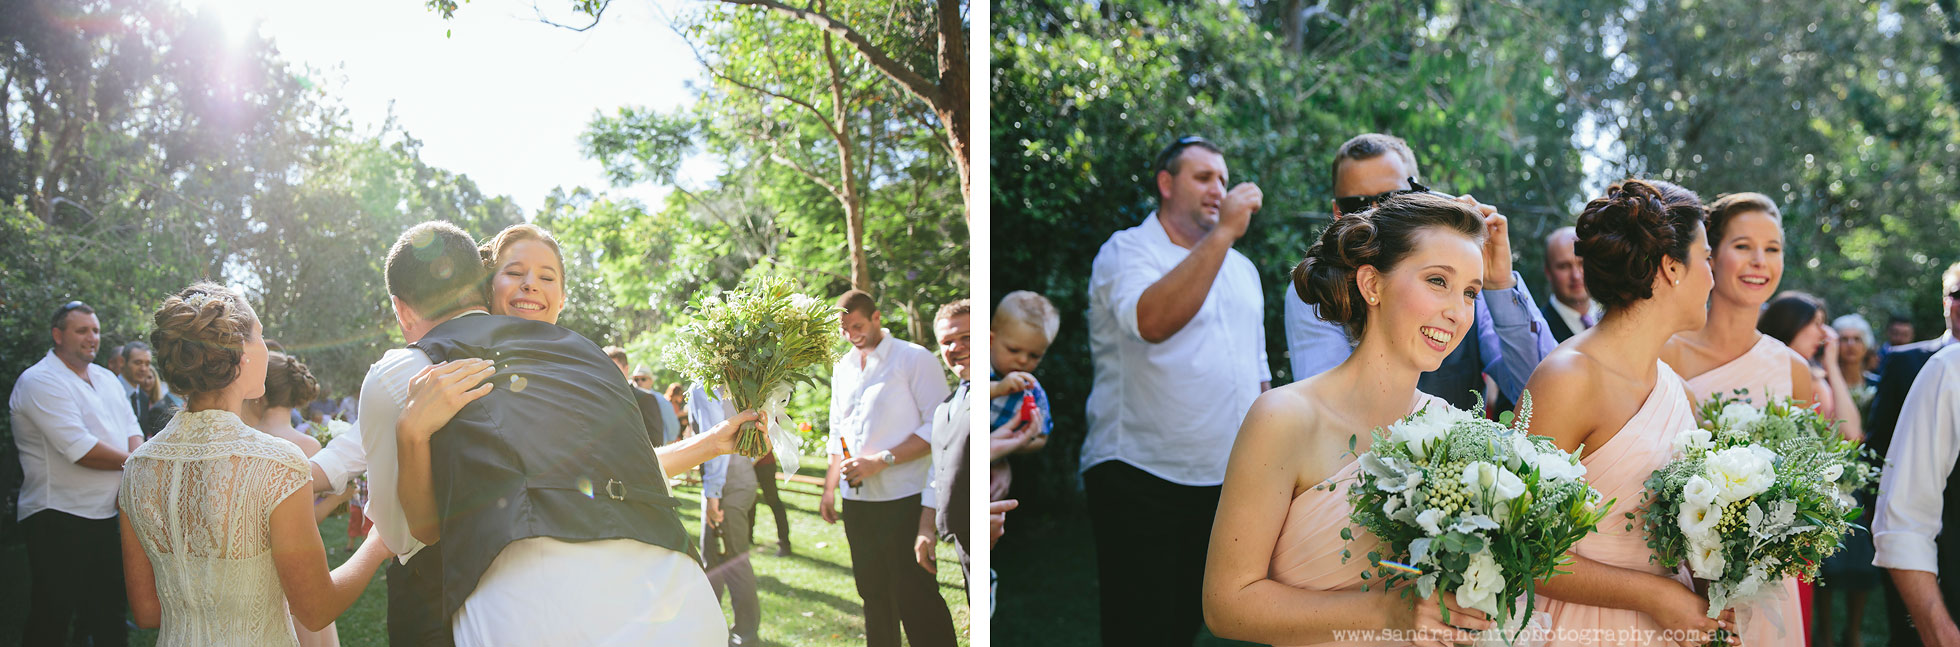 Port-Stephens-Wedding-Photographer-Central-Coast-22.jpg